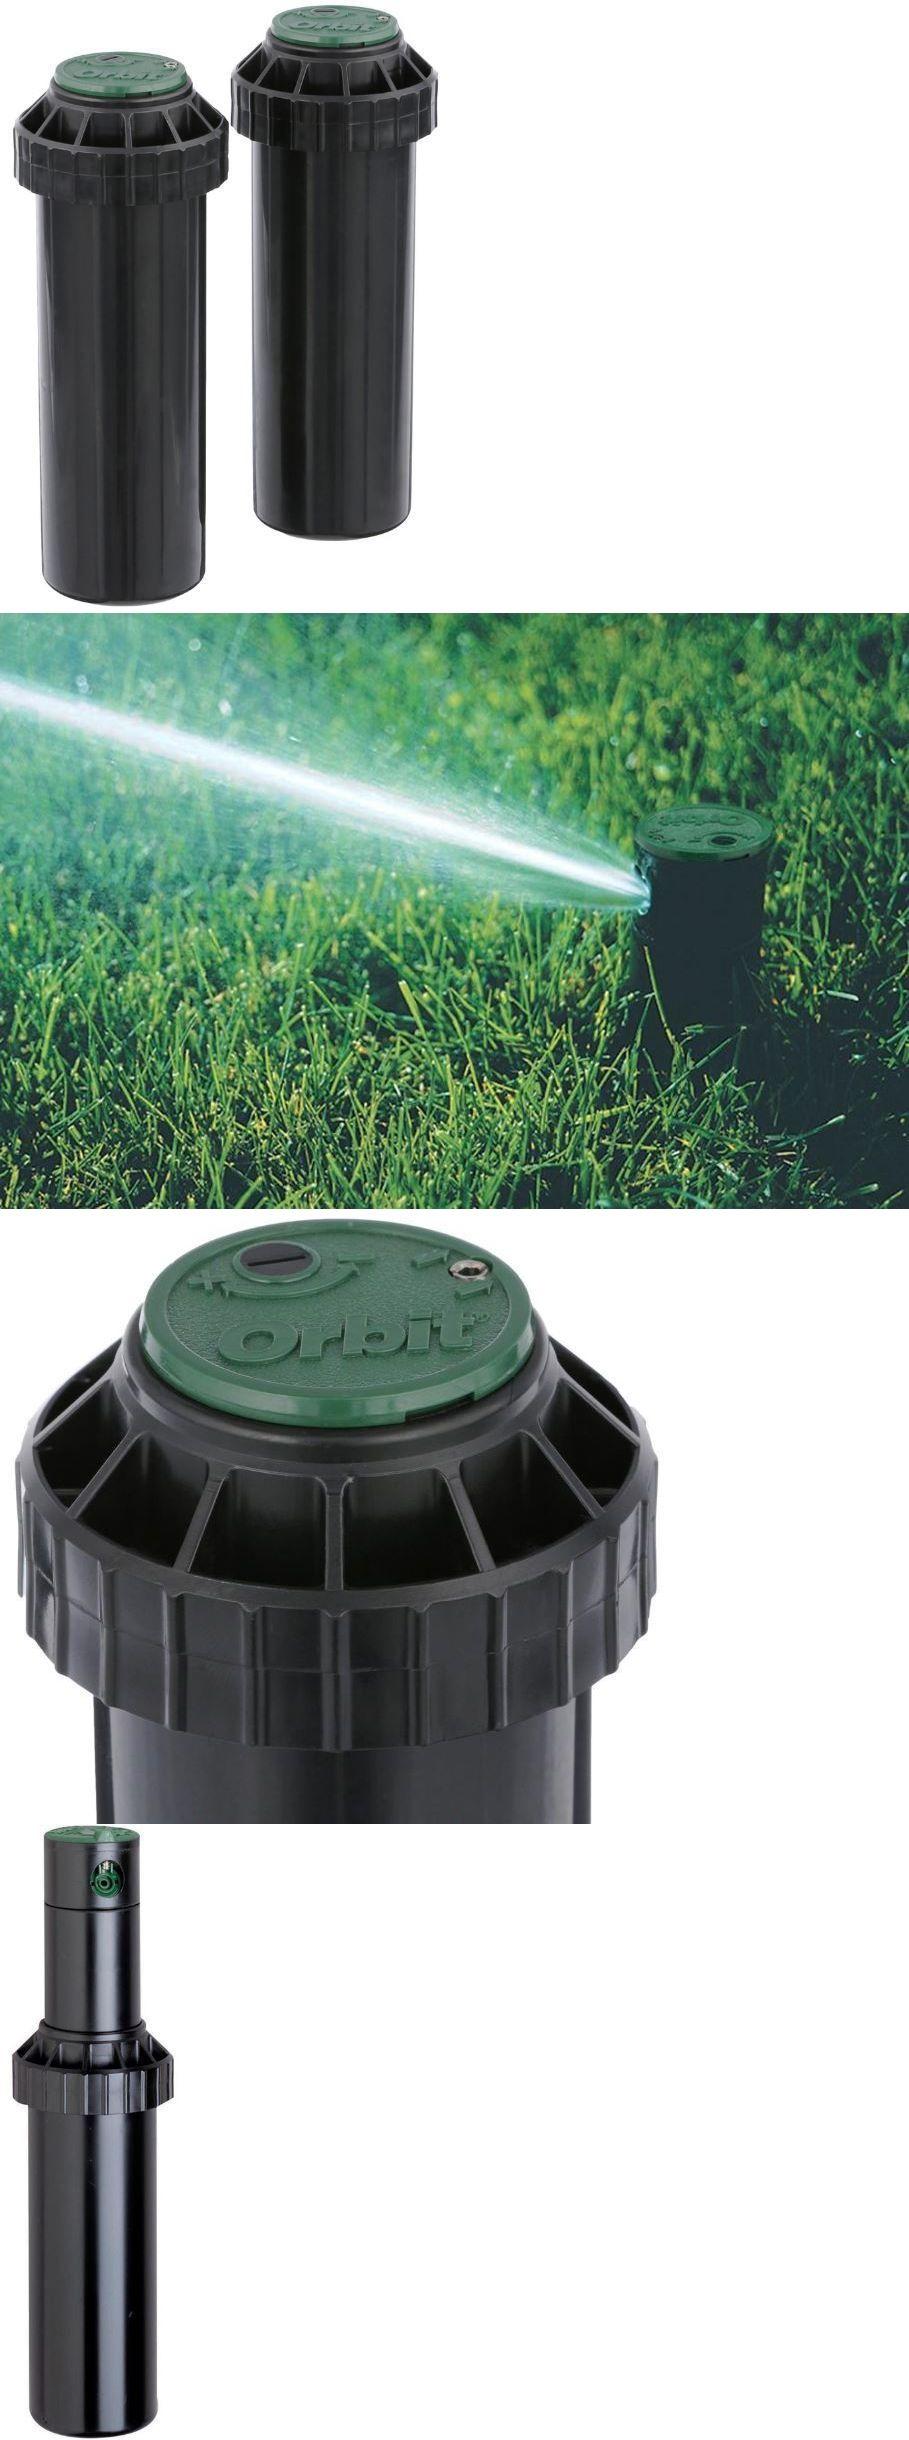 Lawn Sprinklers 20542 Gear Drive Pop Up Rotary Sprinkler Head In Ground System Adjustable Spray 2 Pack Buy It Now Only Lawn Sprinklers Sprinkler Gear Drive